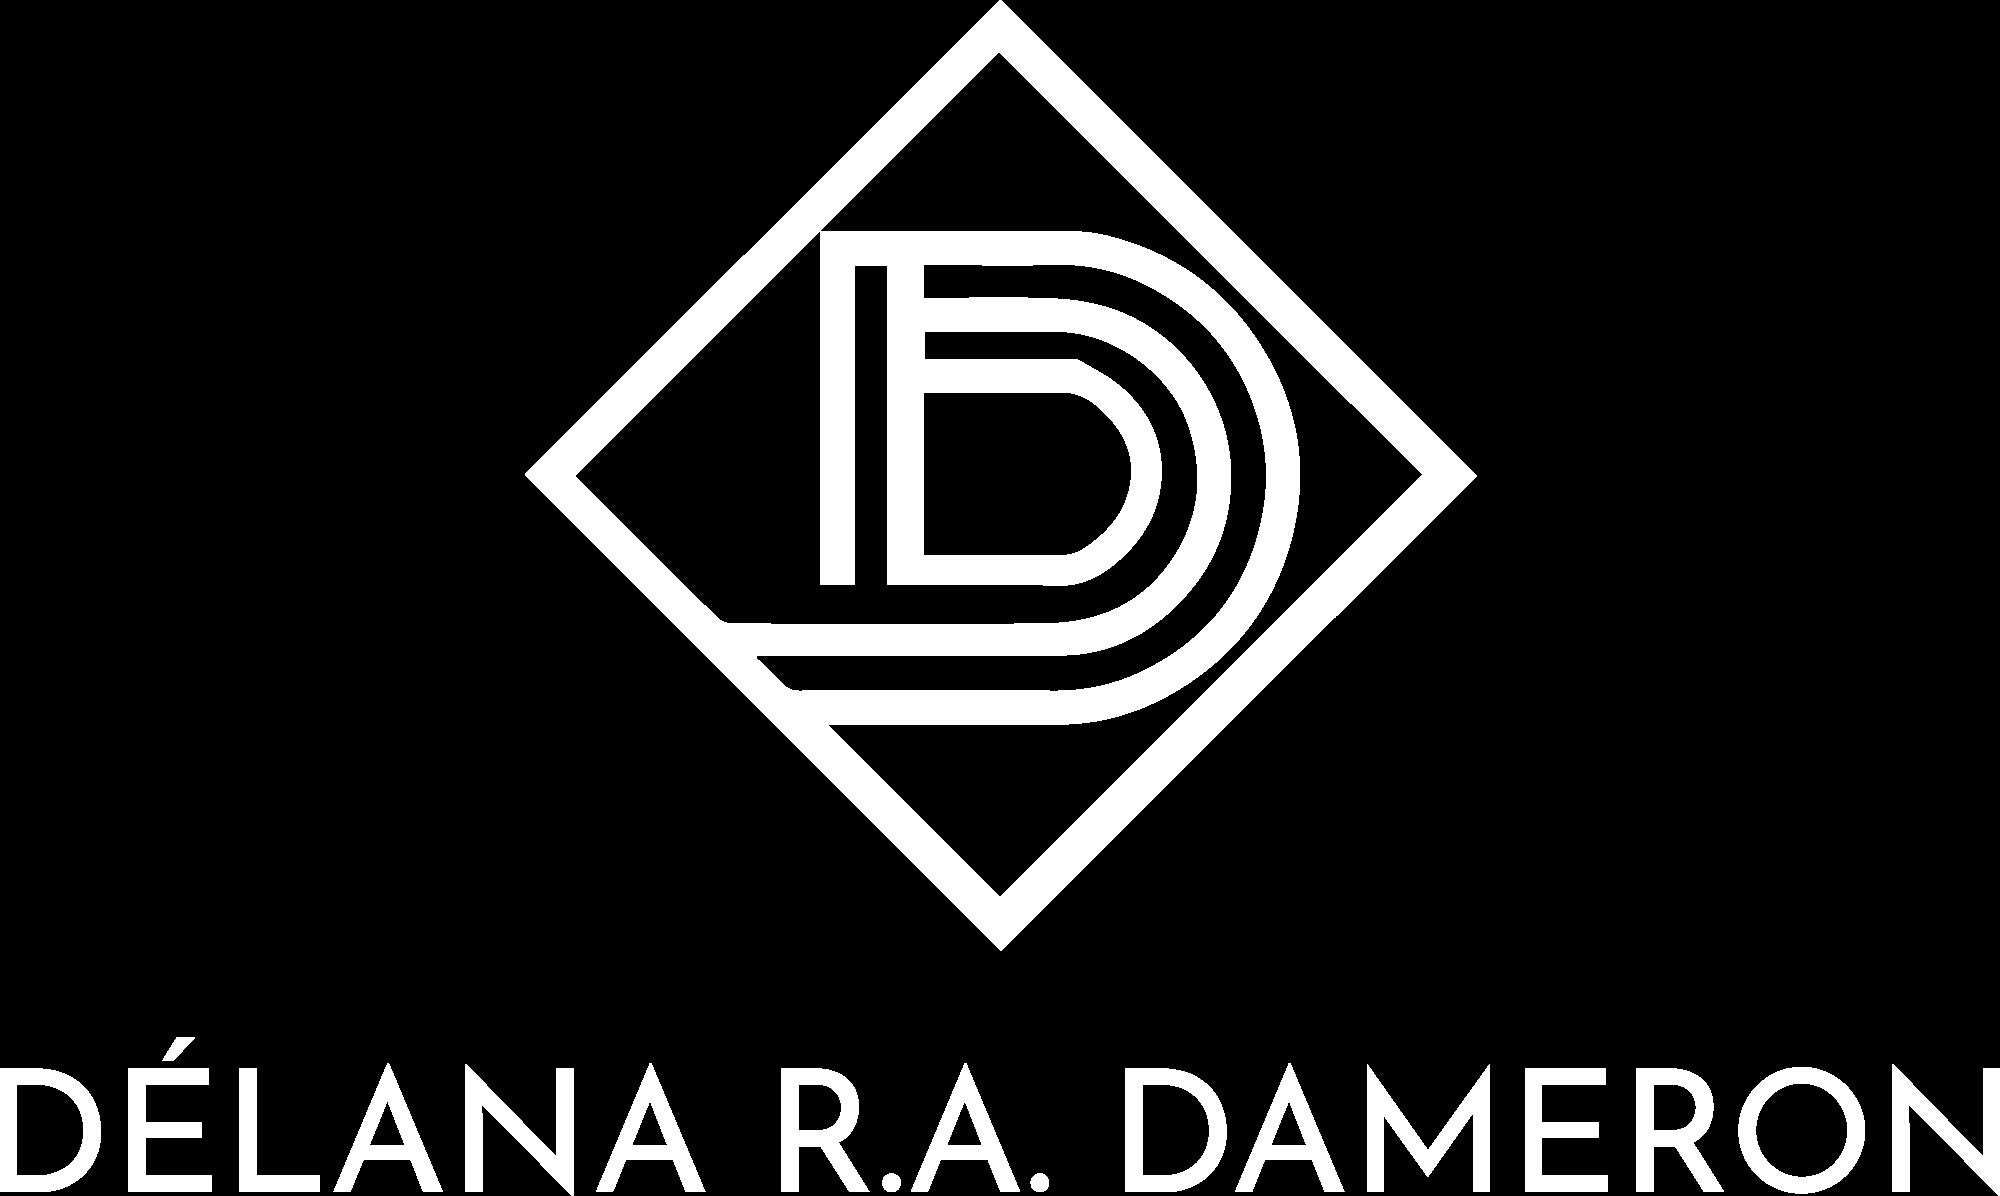 DéLana R.A. Dameron